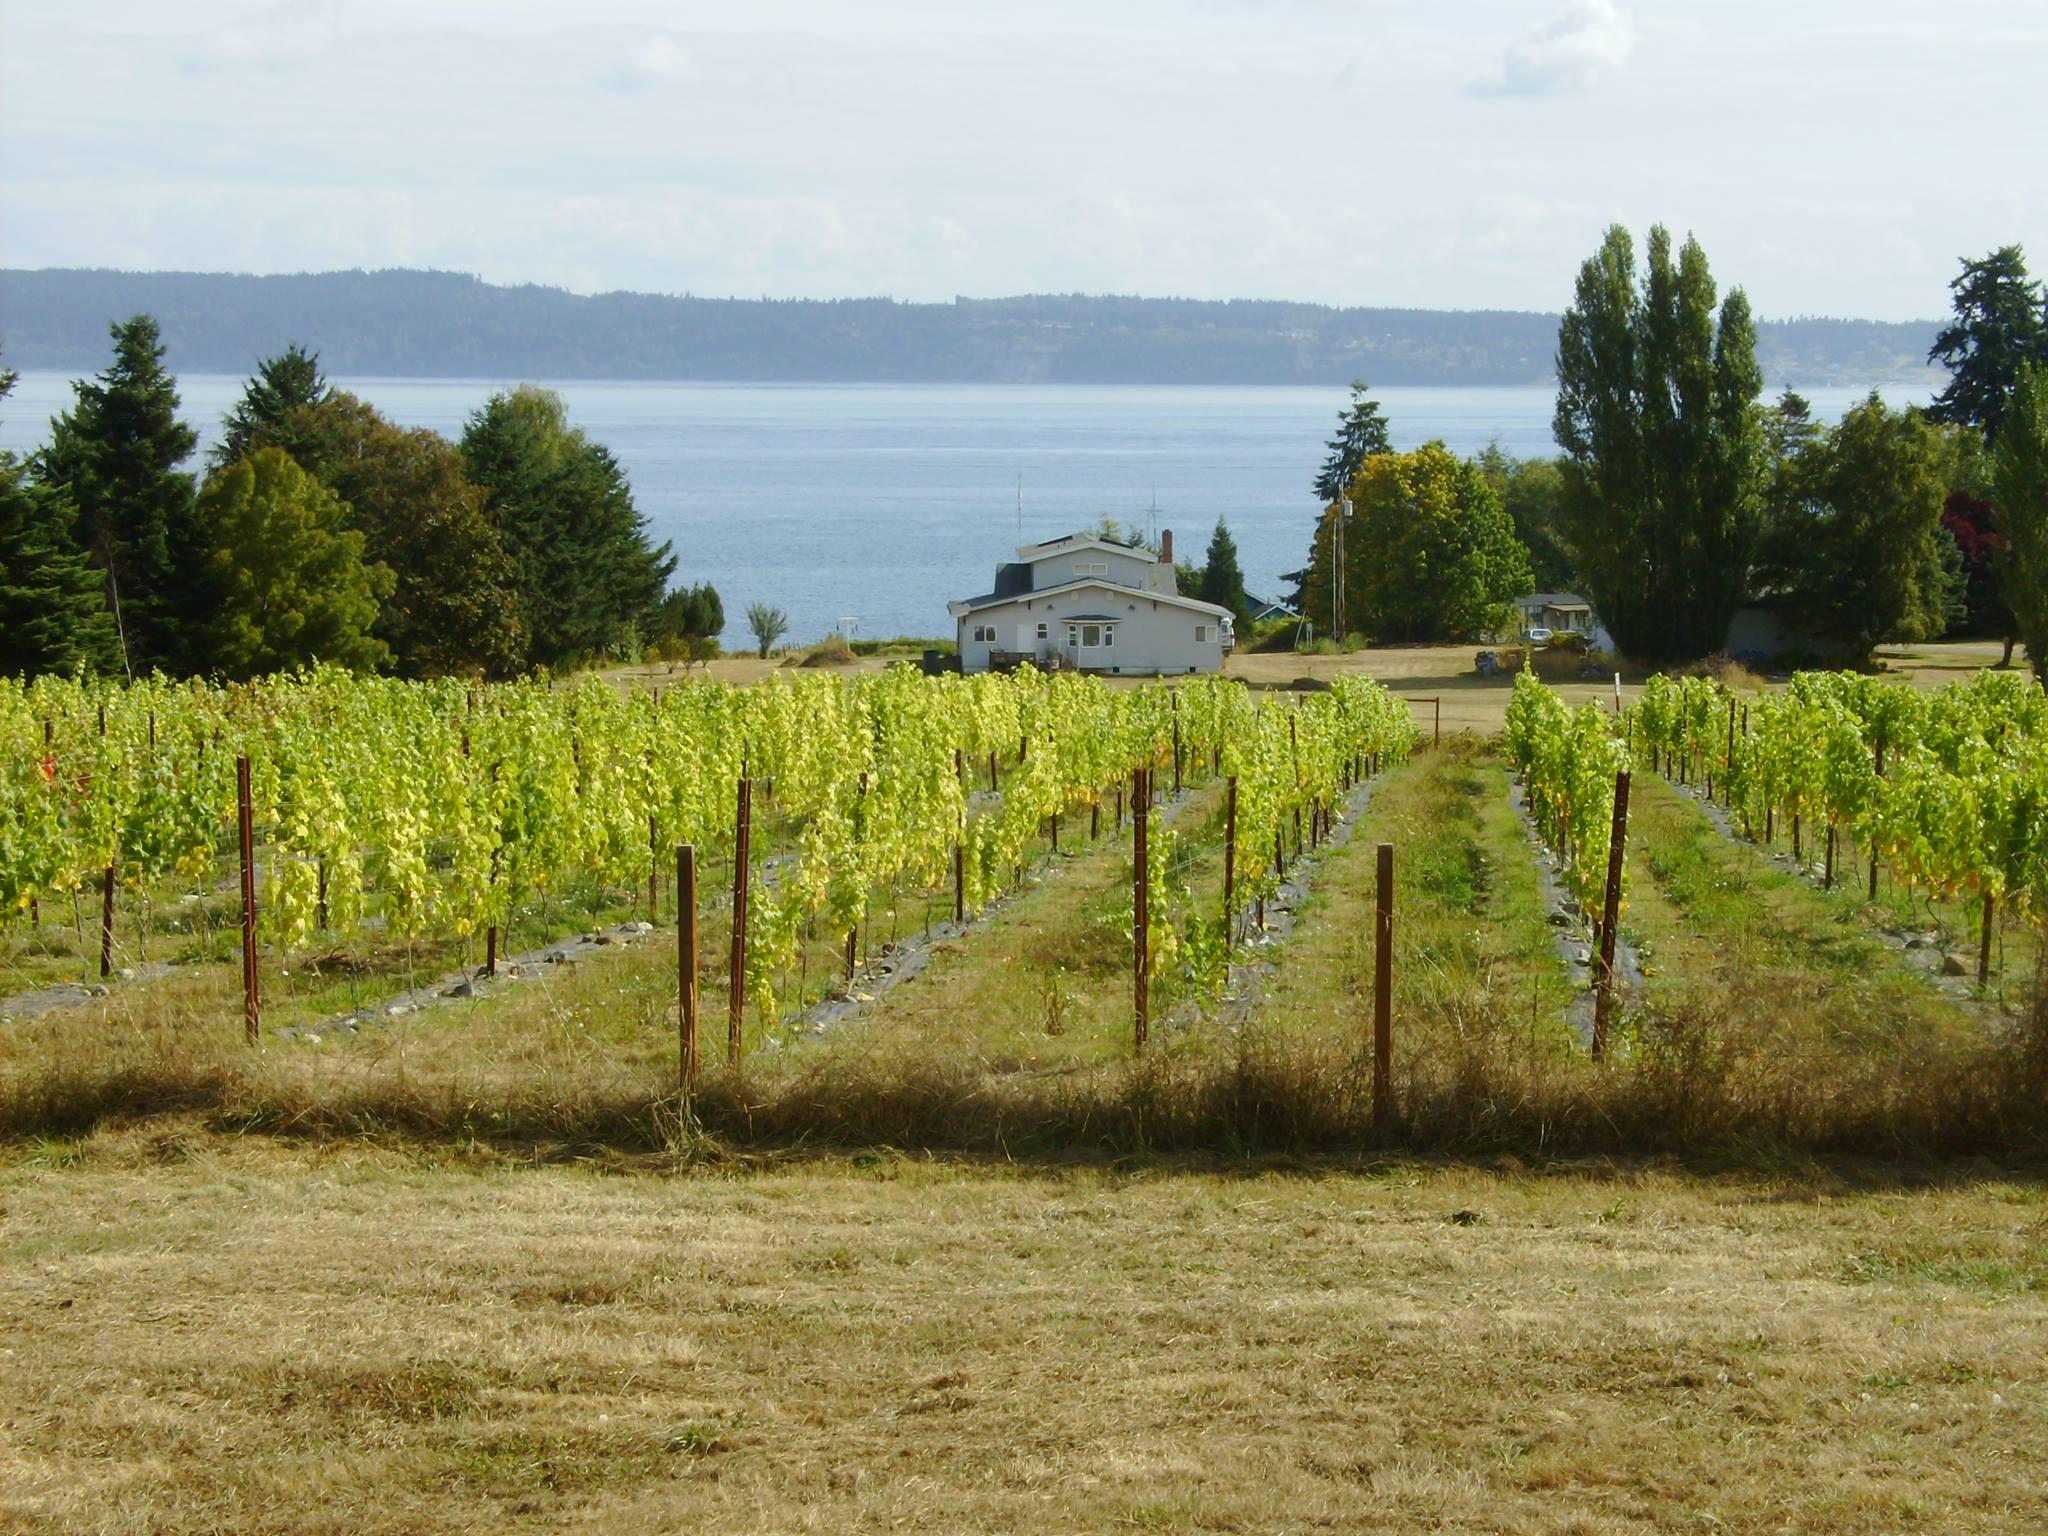 Marrowstone Vineyards, Marrowstone Island, Wine